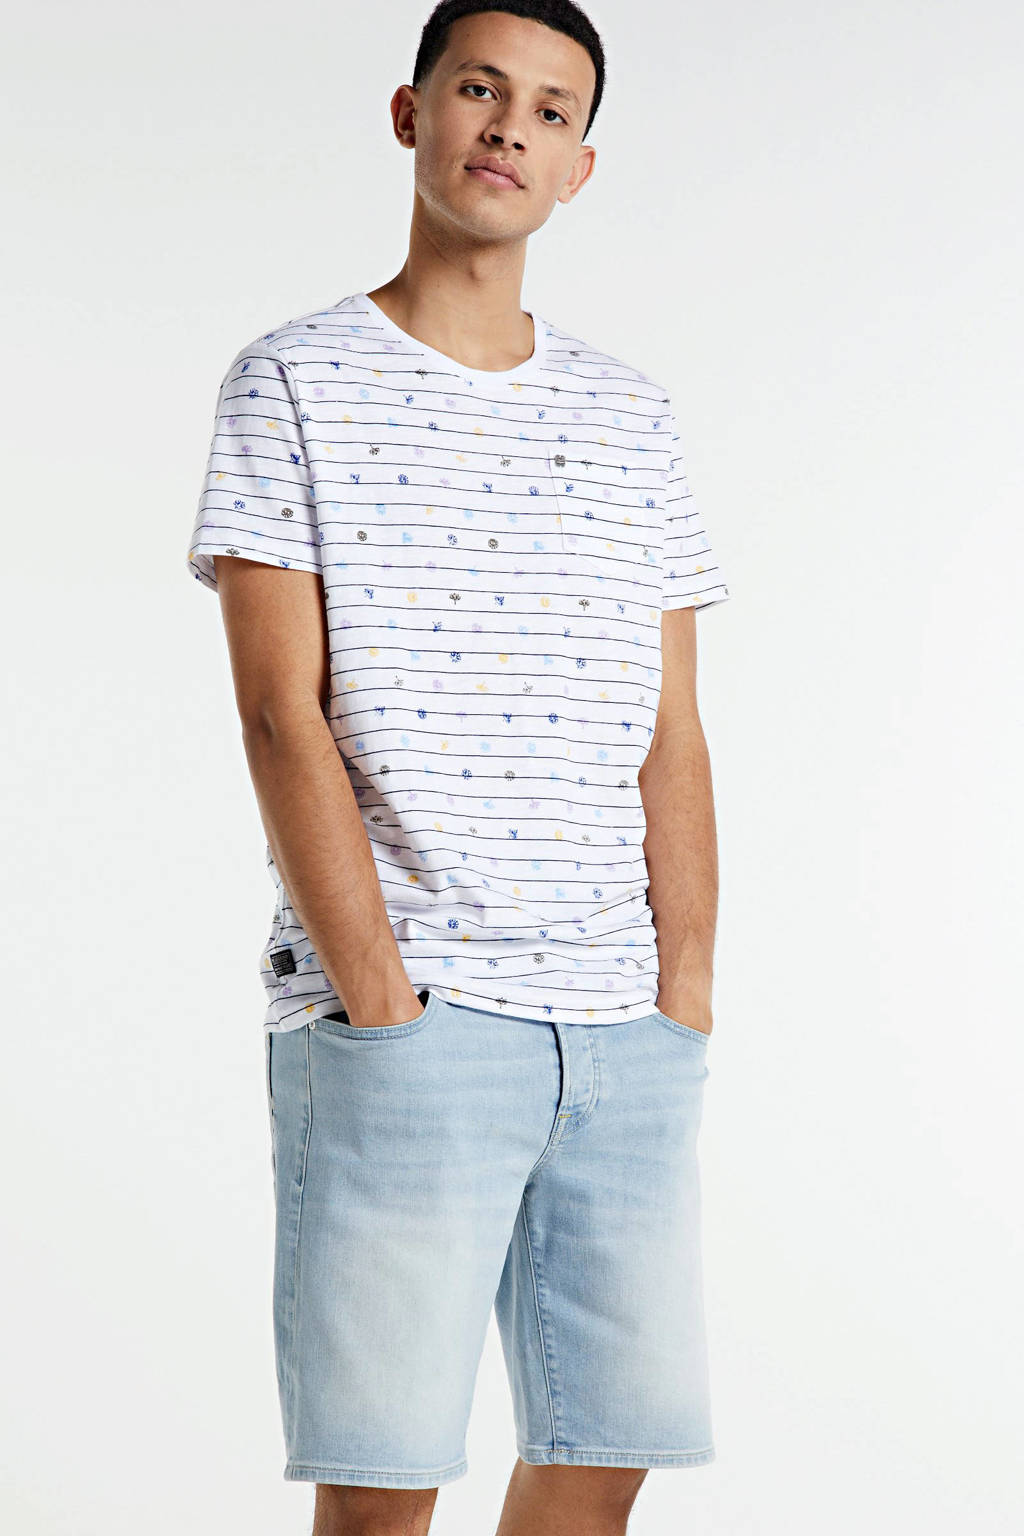 PME Legend gestreept T-shirt wit/blauw, Wit/blauw